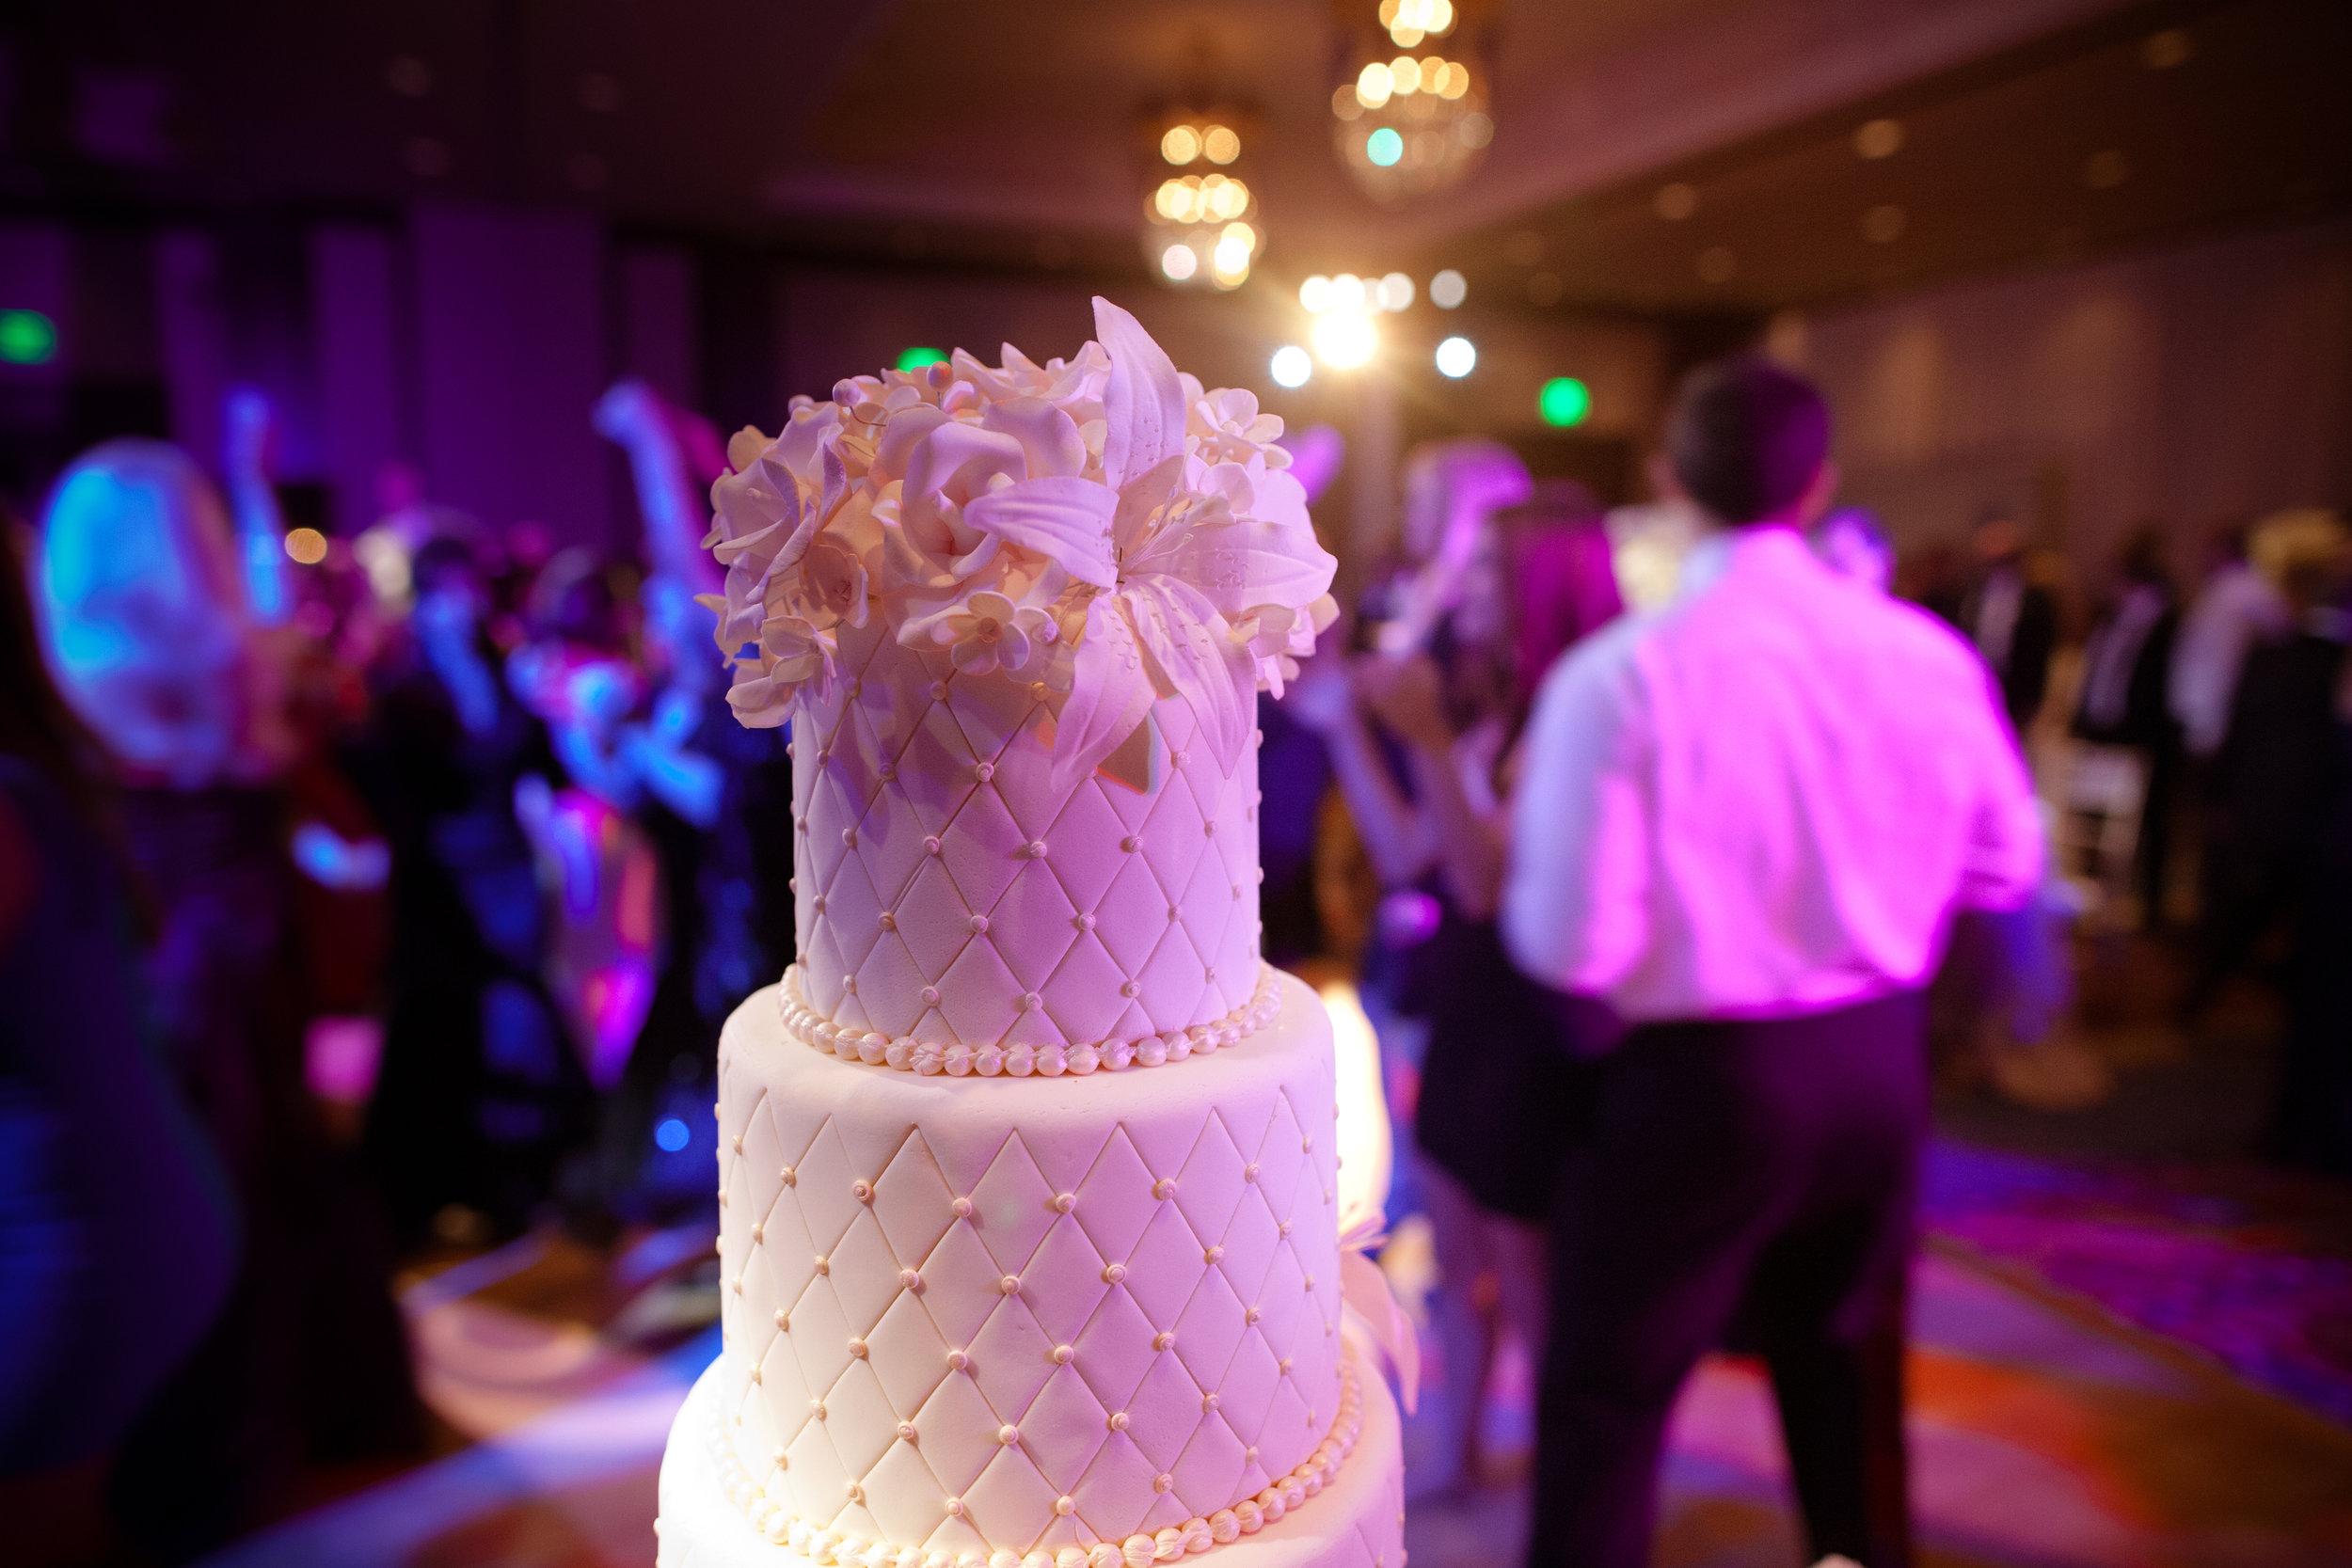 45   wedding cake closeup detailed wedding cake simple wedding cake all white wedding cake flowers on wedding cake Christine Johnson Photography Life Design Events.jpg